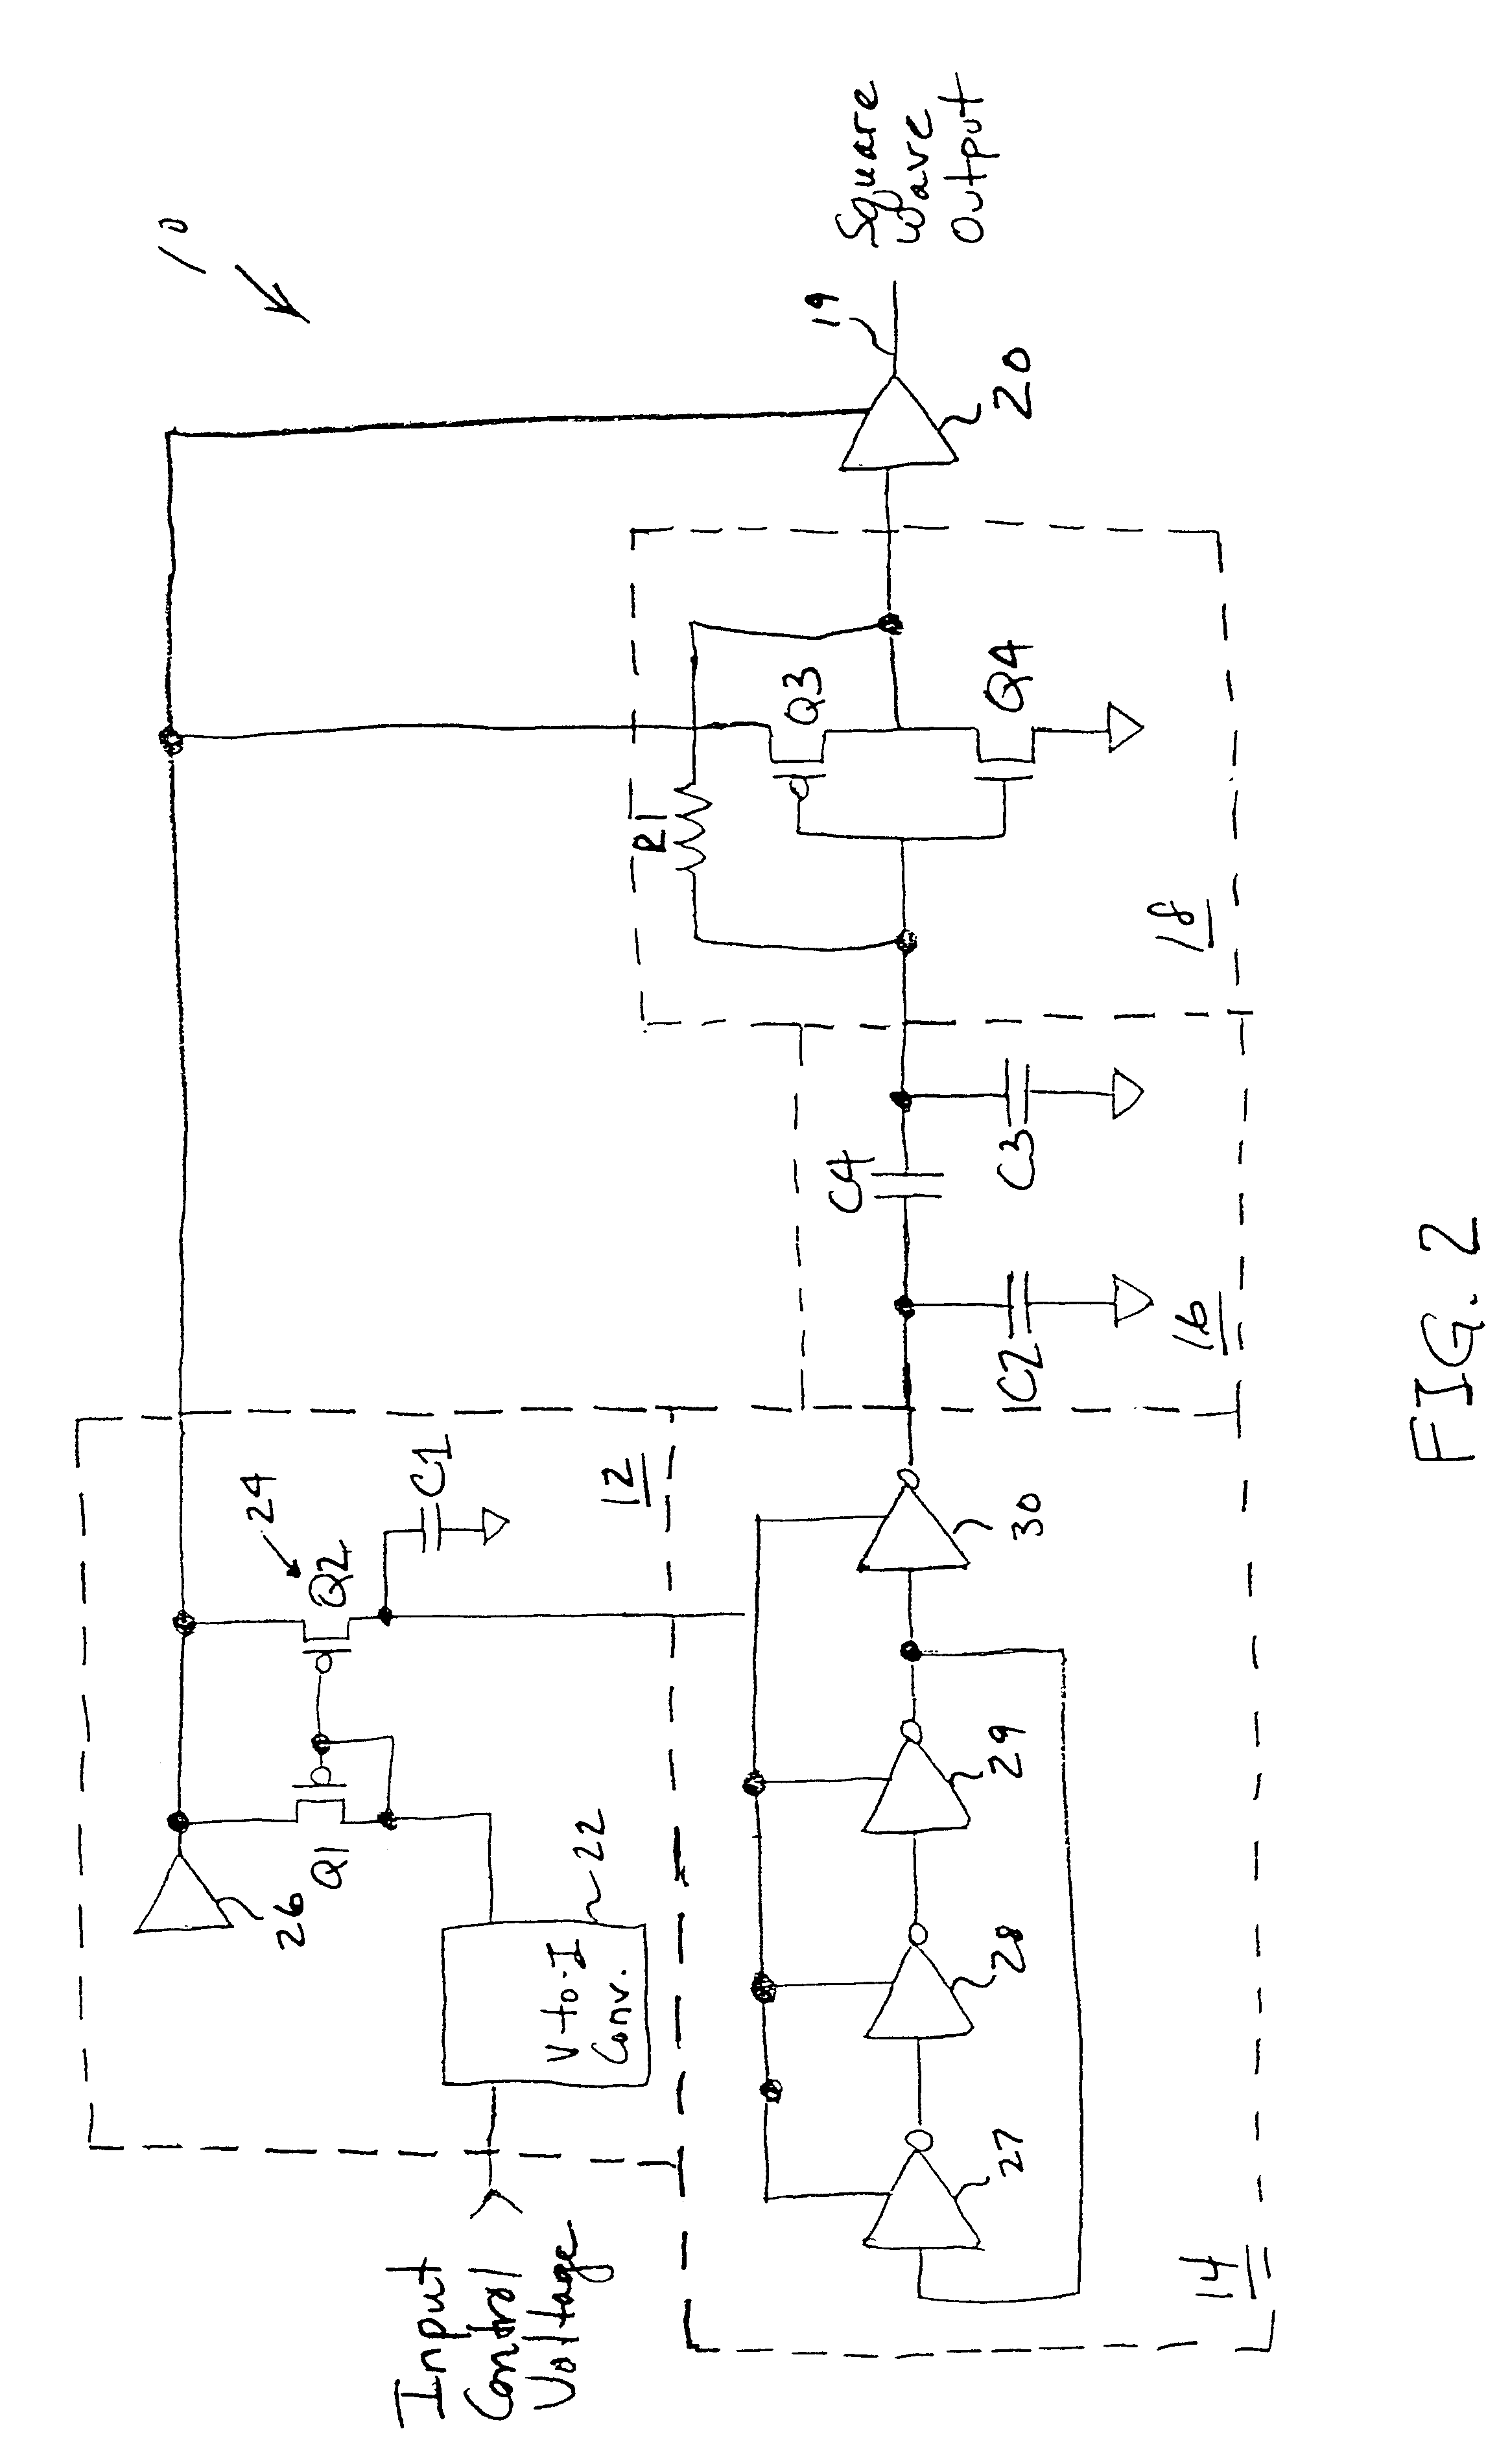 10 Hz To Khz Voltage Controlled Oscillator Circuit Auto To10volts Addaconvertercircuit Diagram Seekiccom Volt Control Page 3 Circuits Next Gr